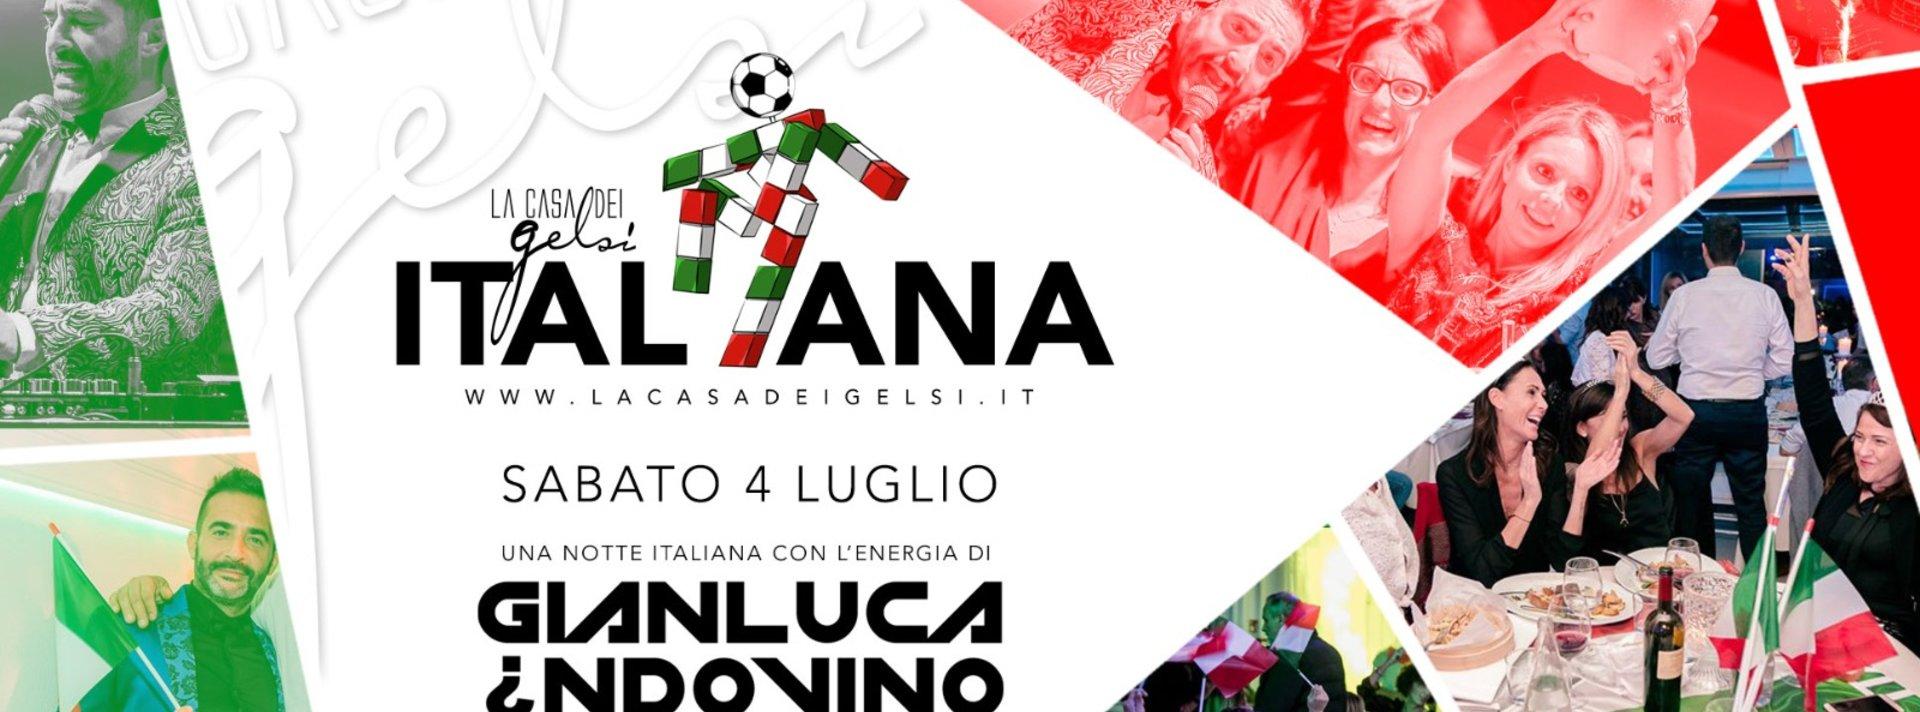 Italiana - 4 luglio 2020